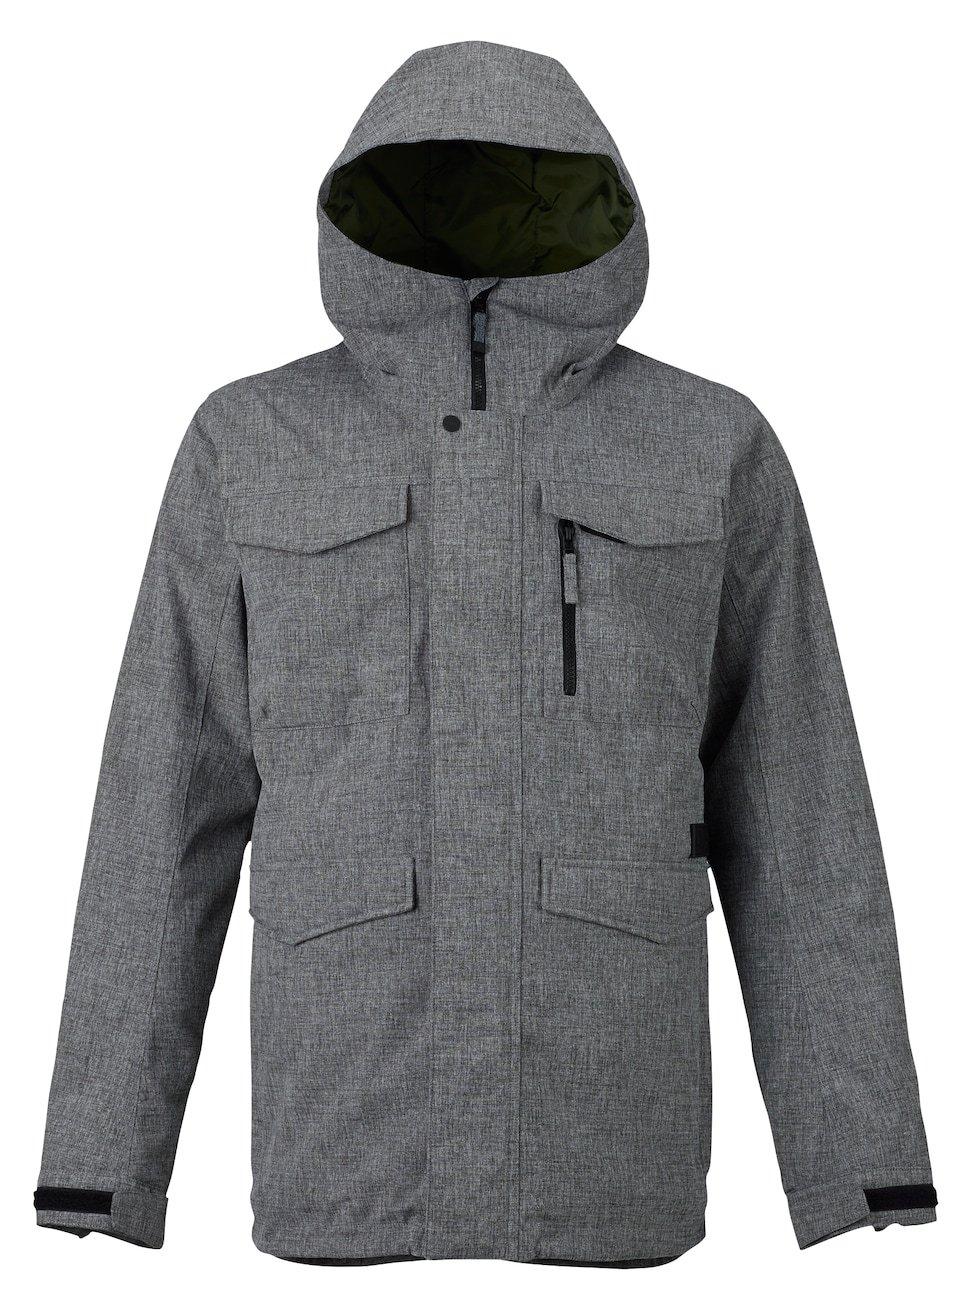 Burton Men's Covert Jacket, Bog Heather, X-Small